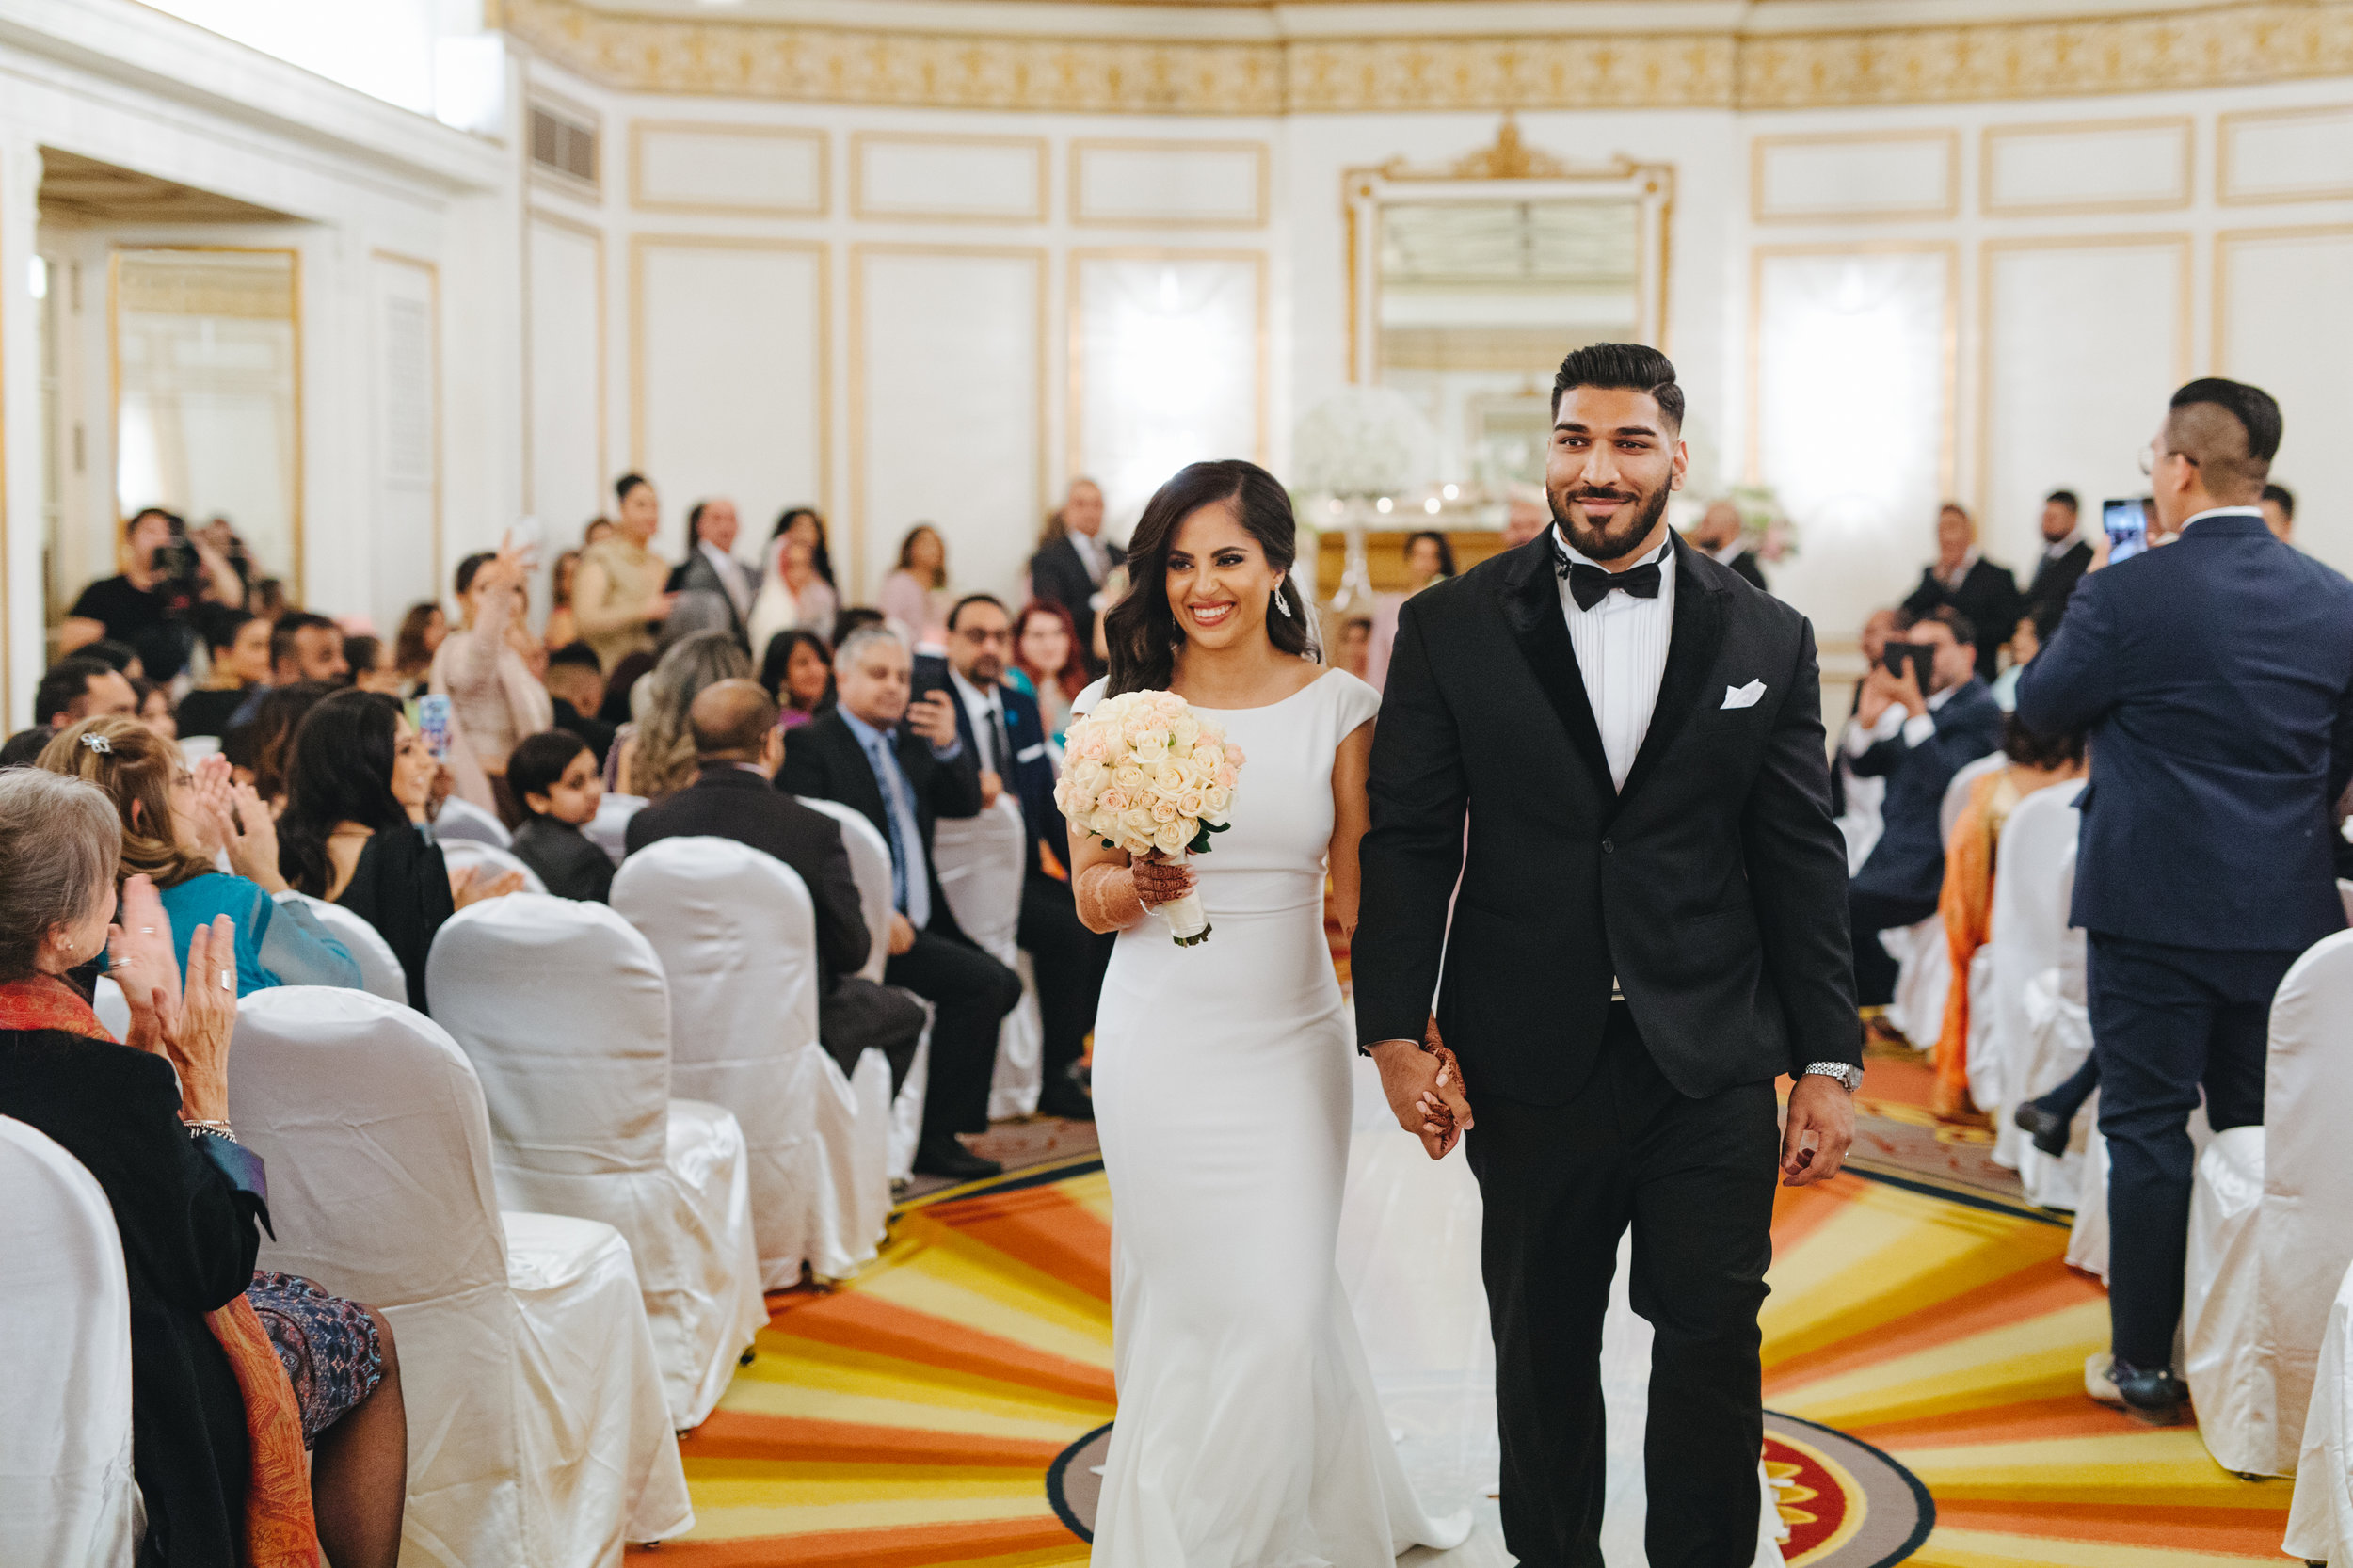 herastudios_wedding_aneesha_kris_hera_selects-55.jpg